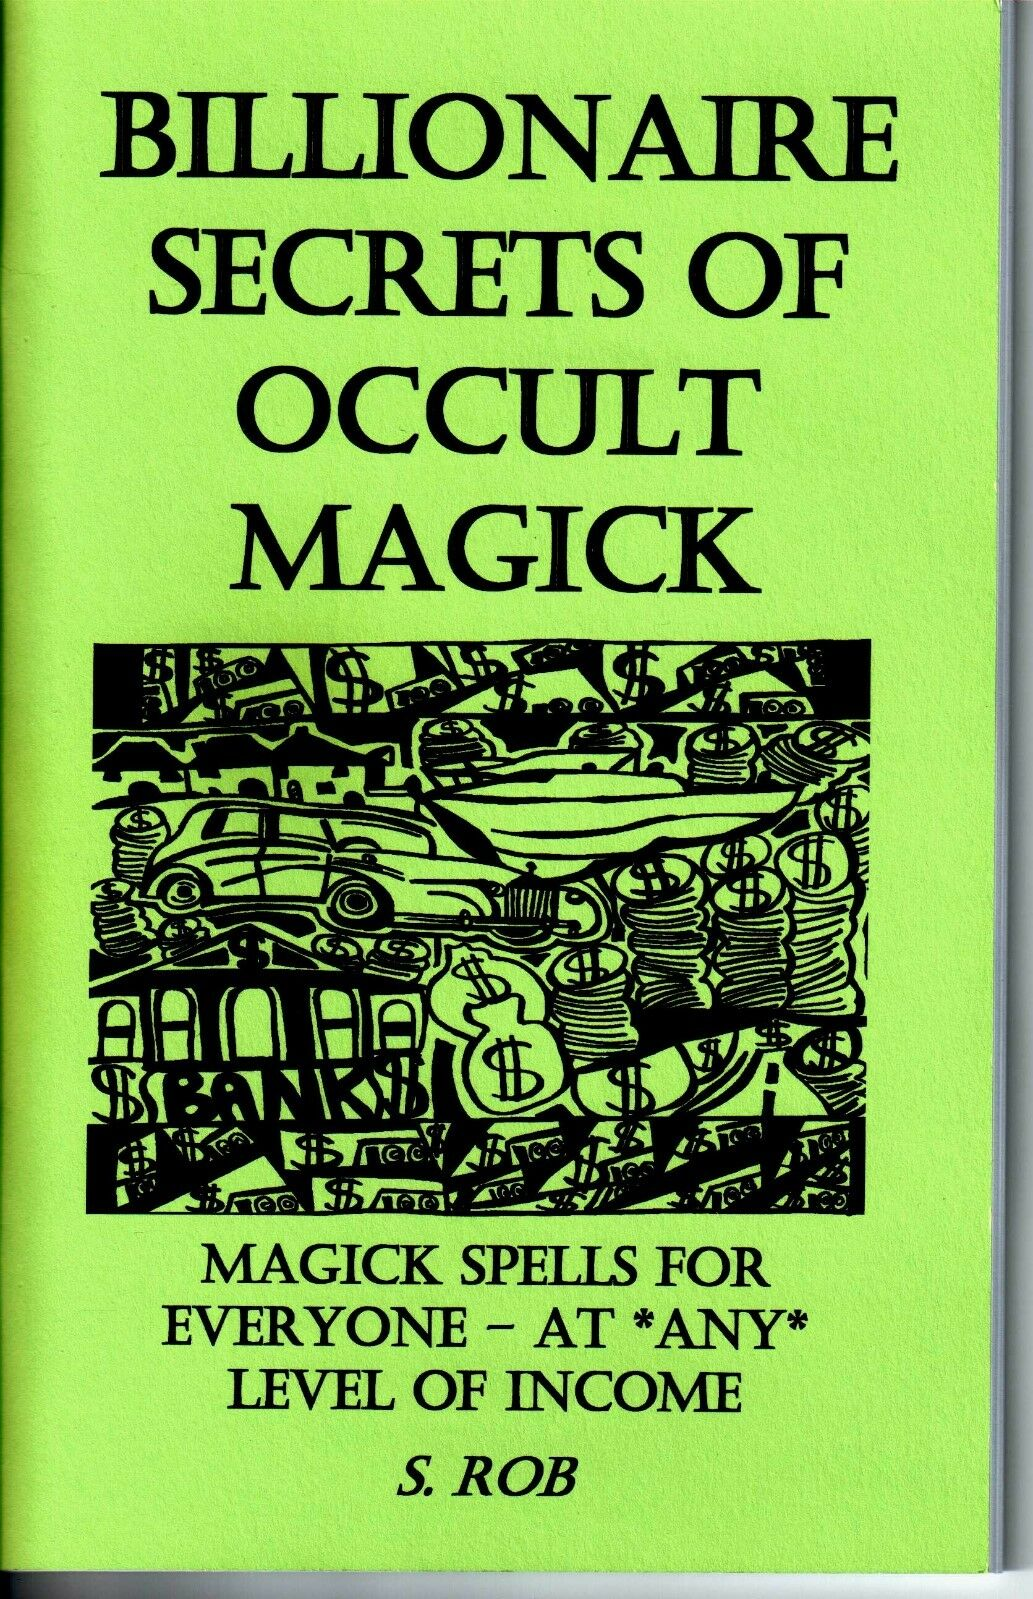 BILLIONAIRE SECRETS OF OCCULT MAGICK book by S. Rob money magic